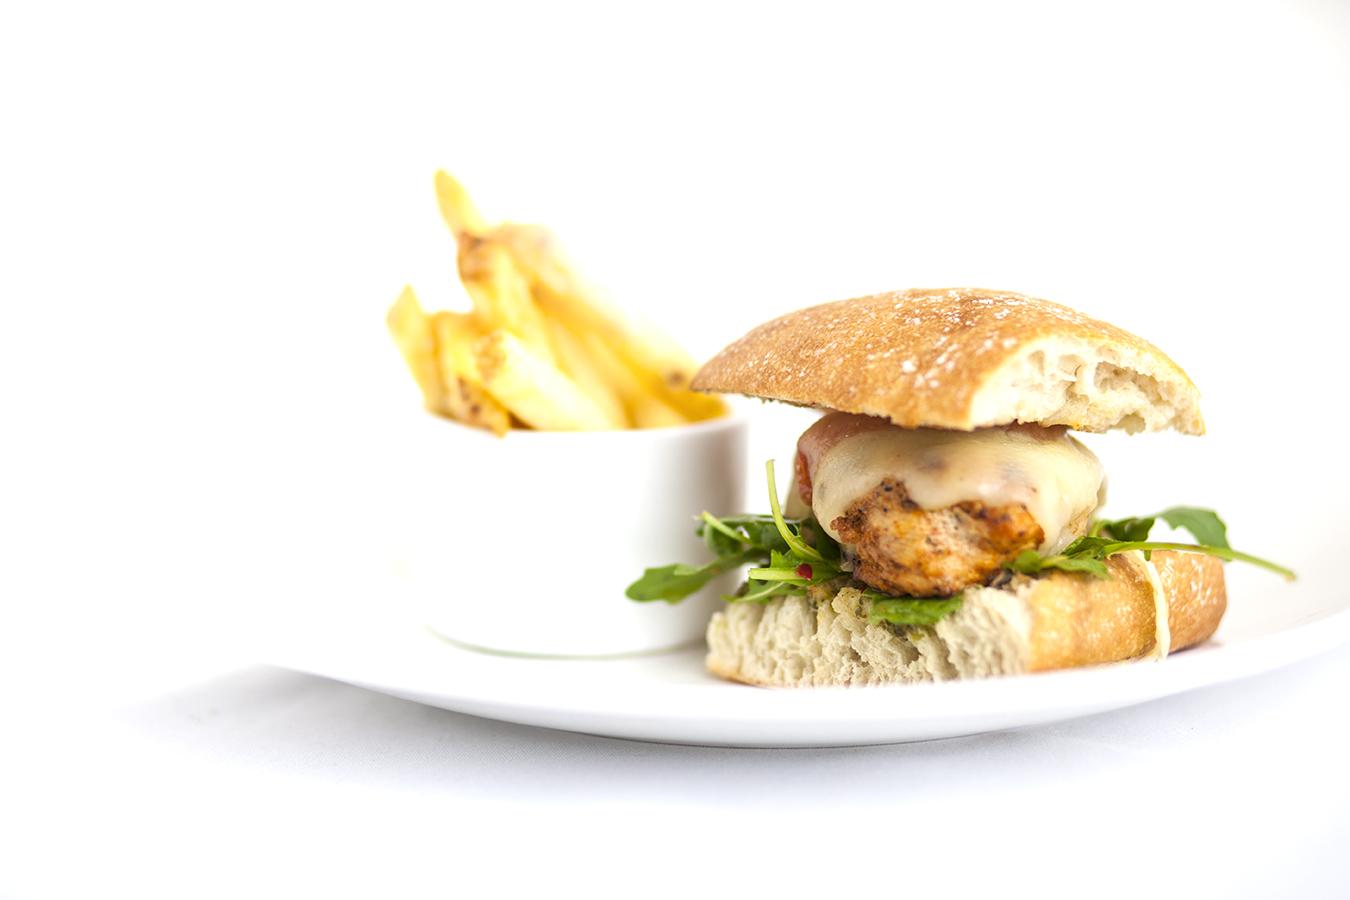 ChickenSandwich.jpg